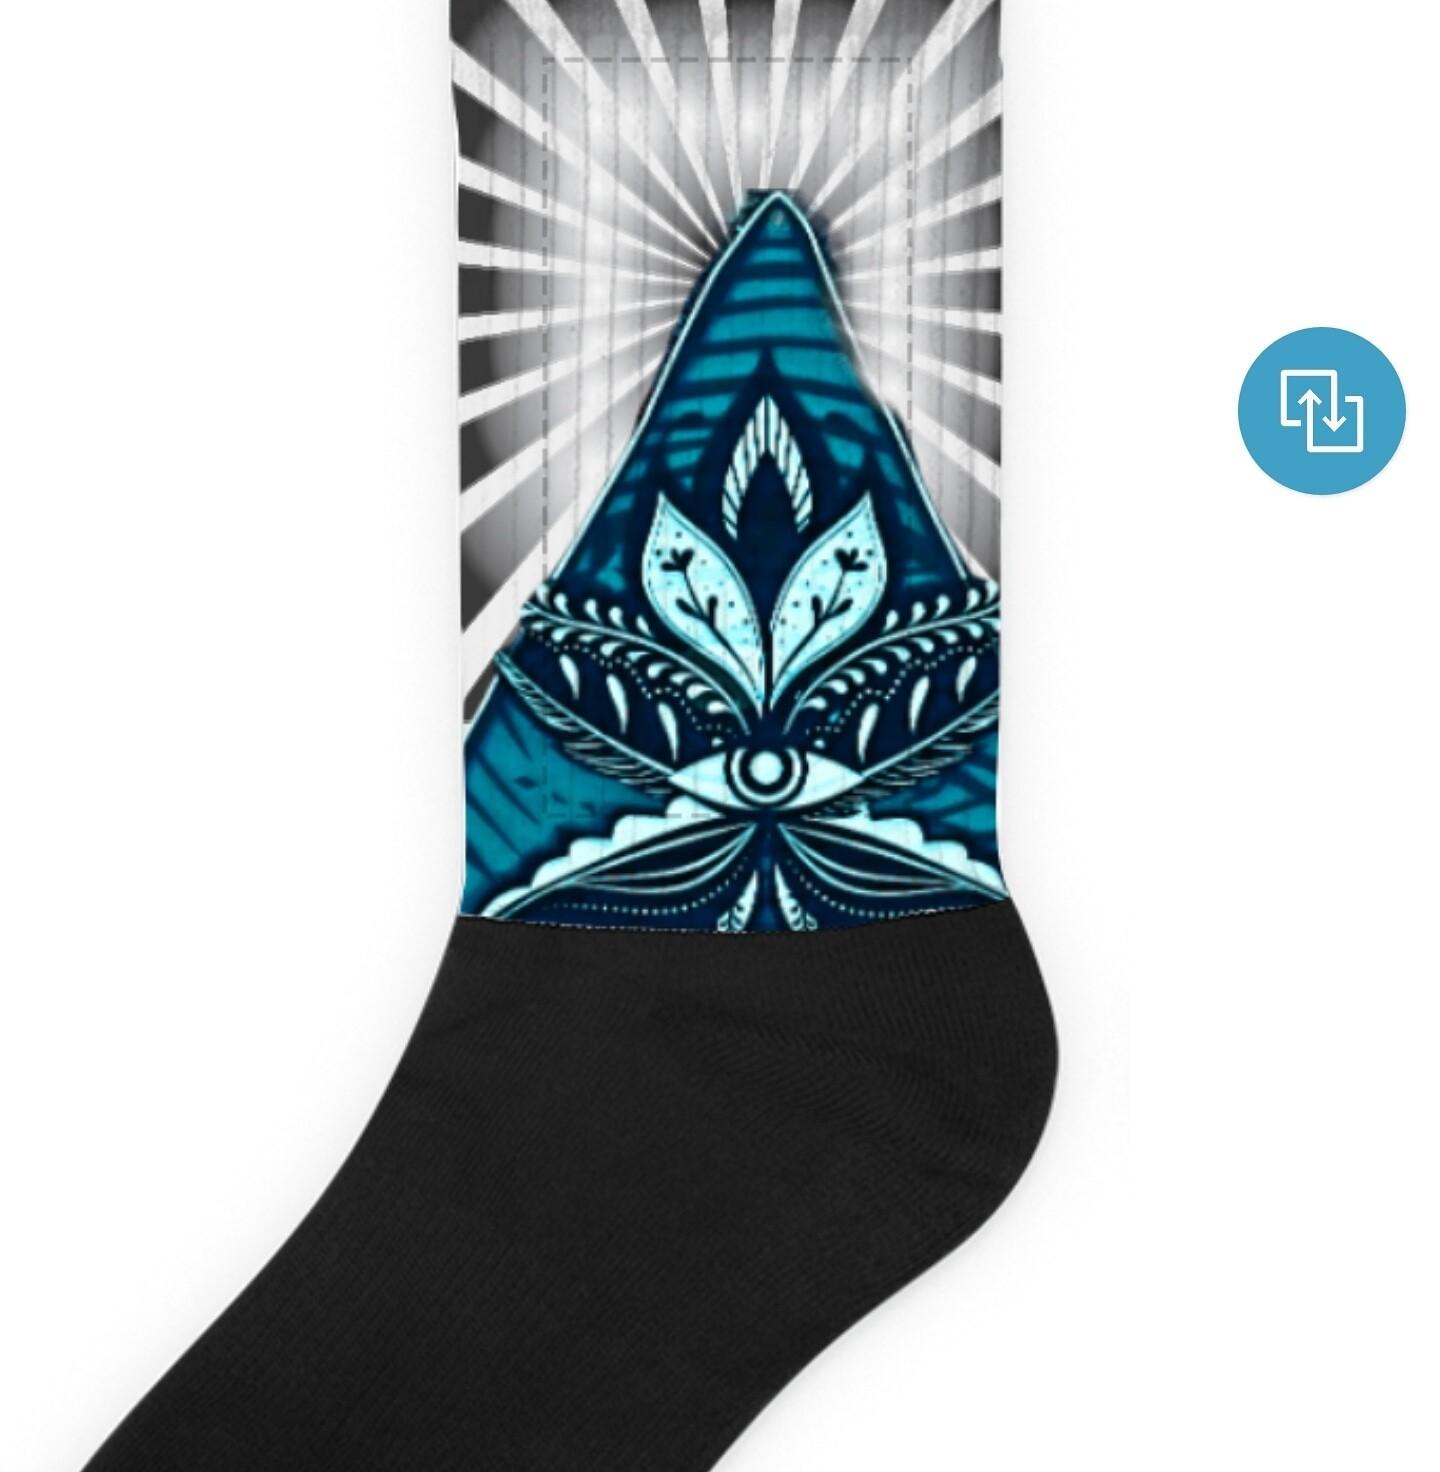 Manifedt destiny socks